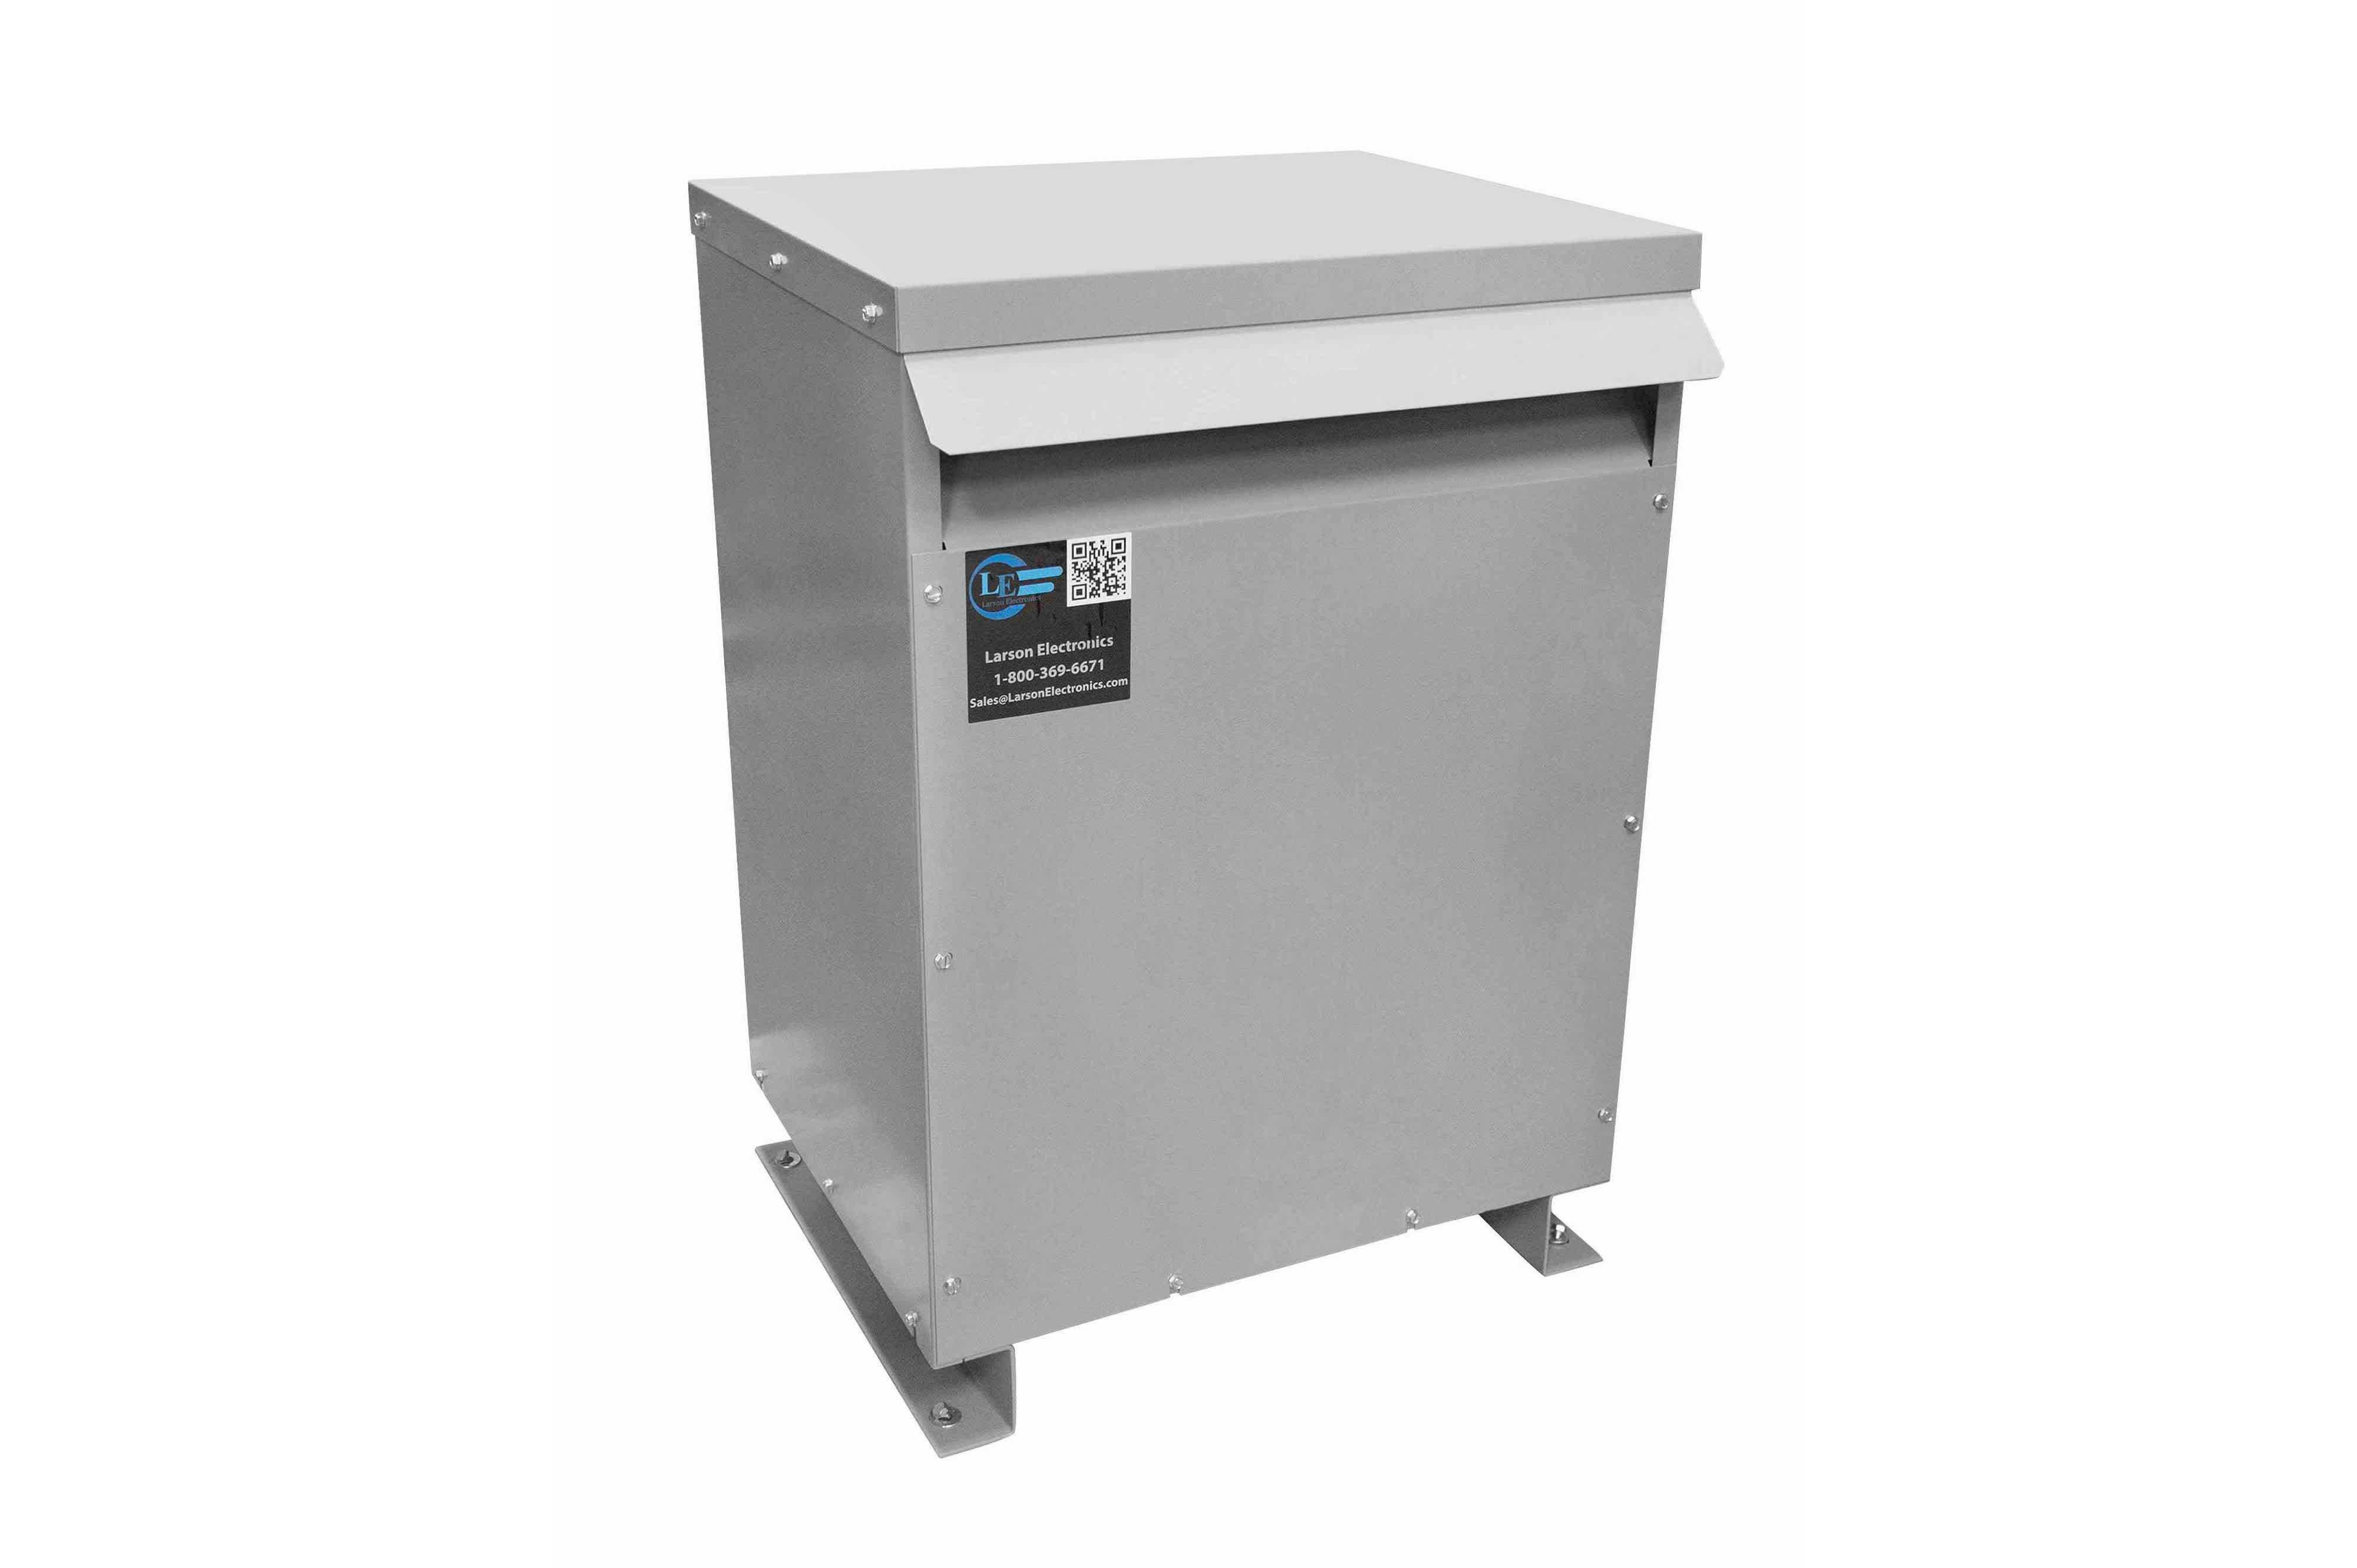 100 kVA 3PH DOE Transformer, 240V Delta Primary, 415Y/240 Wye-N Secondary, N3R, Ventilated, 60 Hz